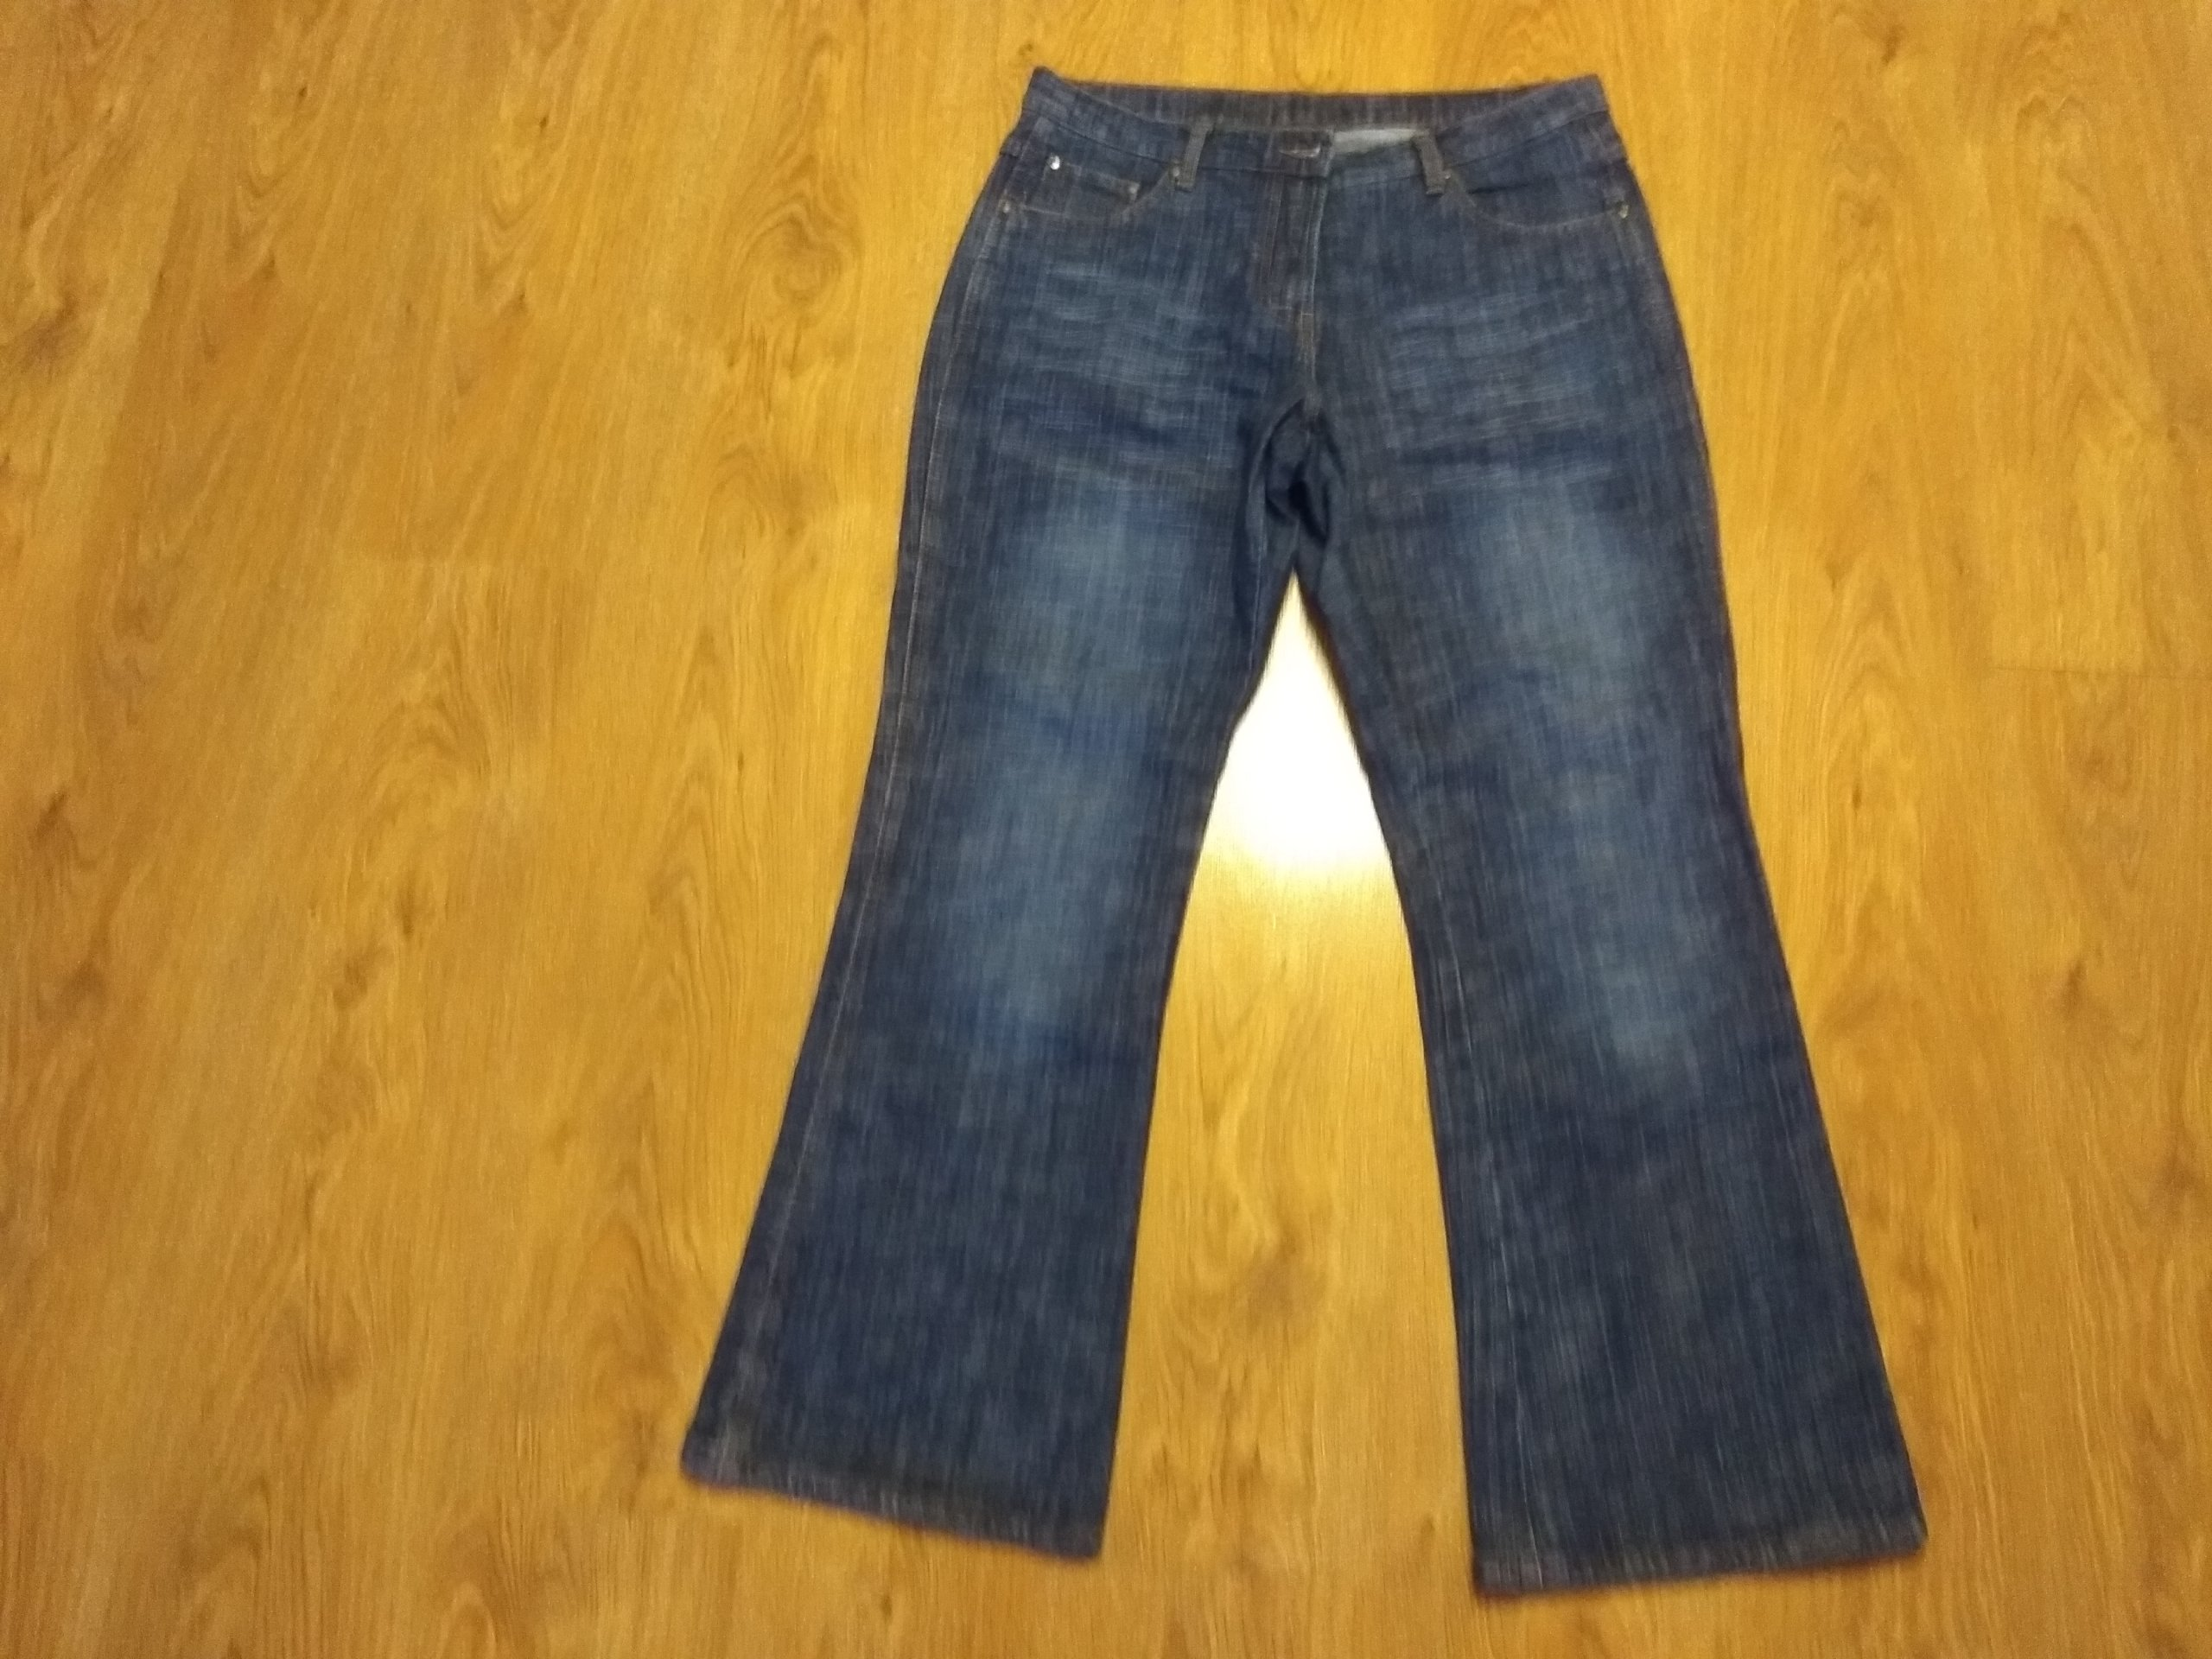 049ff535306c Ciemne jeansy 44 46 - 7297715173 - oficjalne archiwum allegro